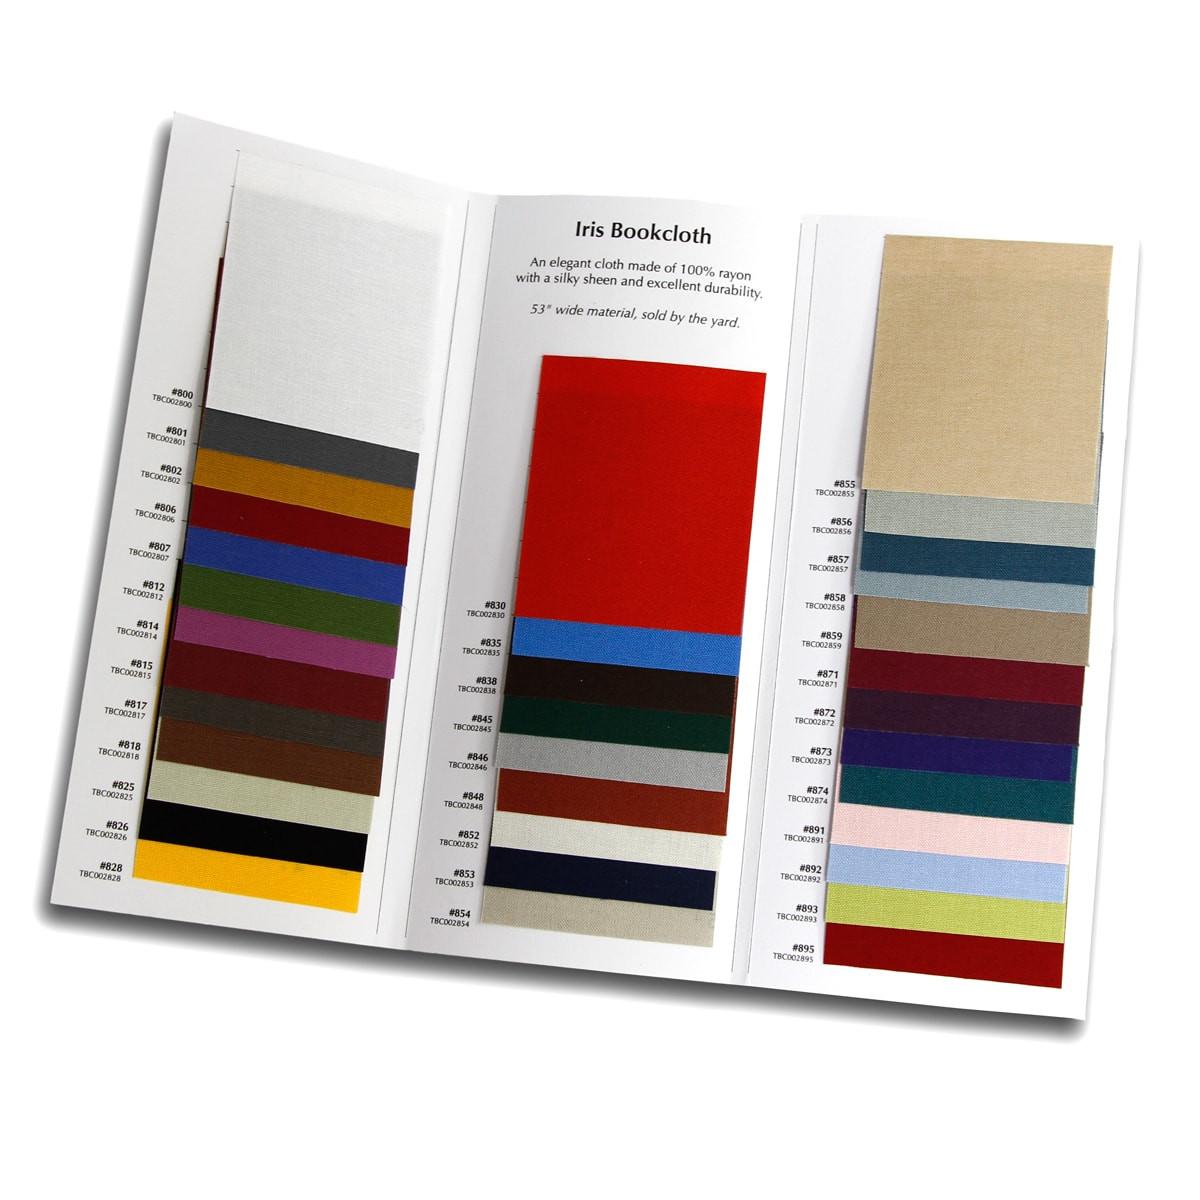 Standard Linen - A sleek cover that feels classic & refined.